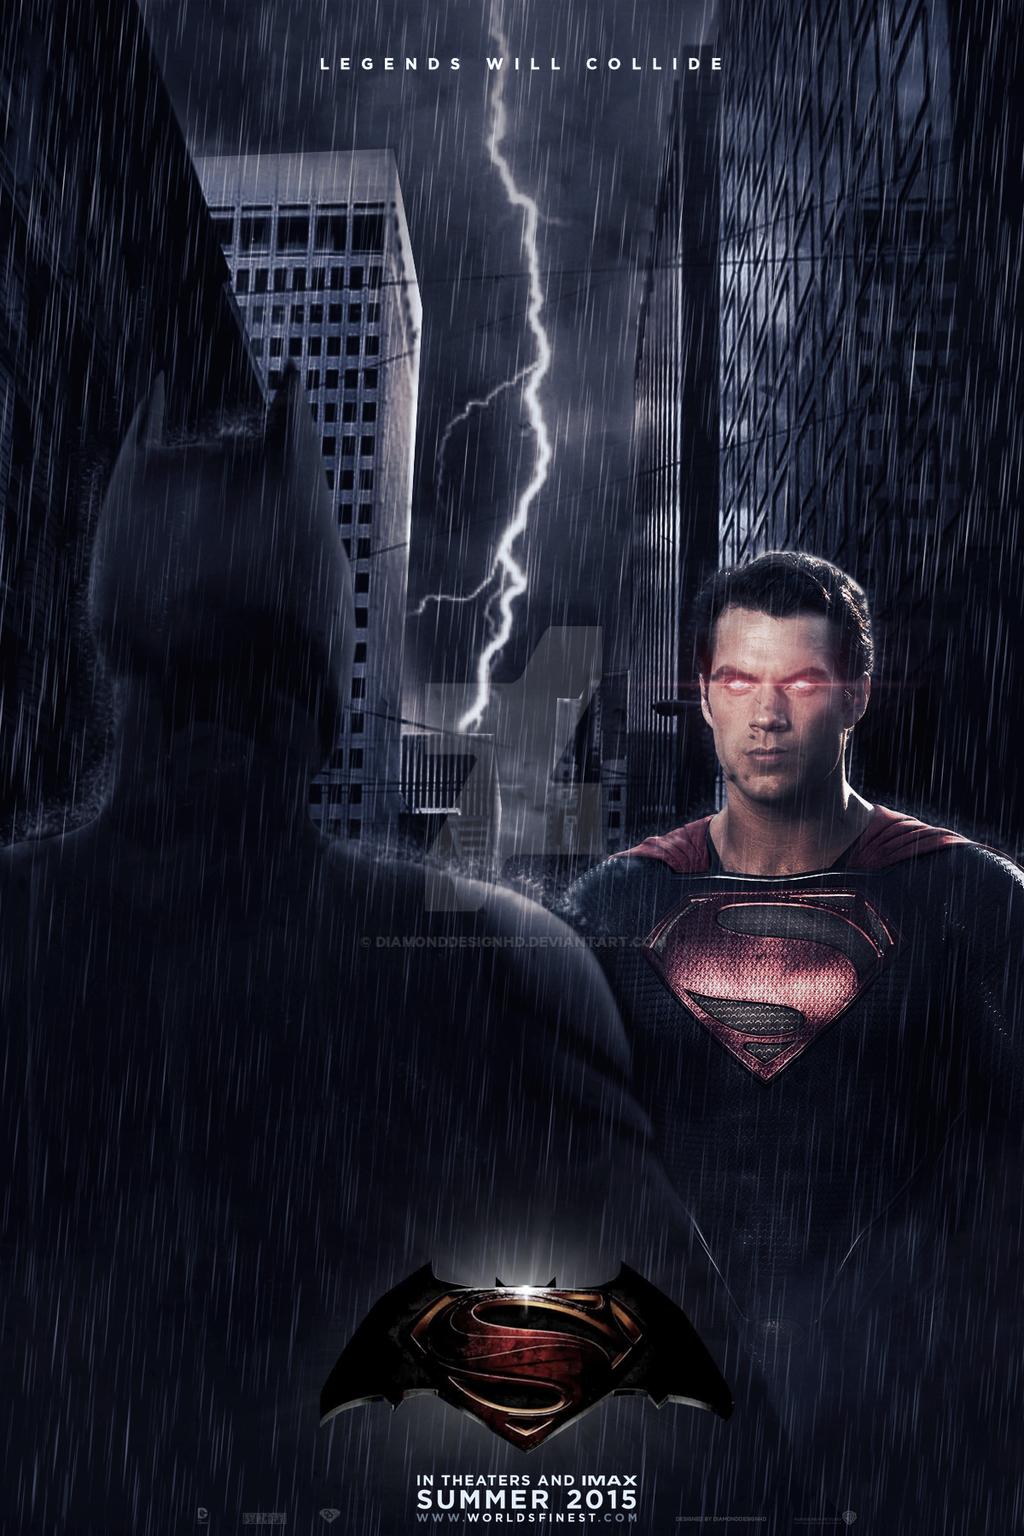 Man of Steel 2/World's Finest (Fan-Made) Poster